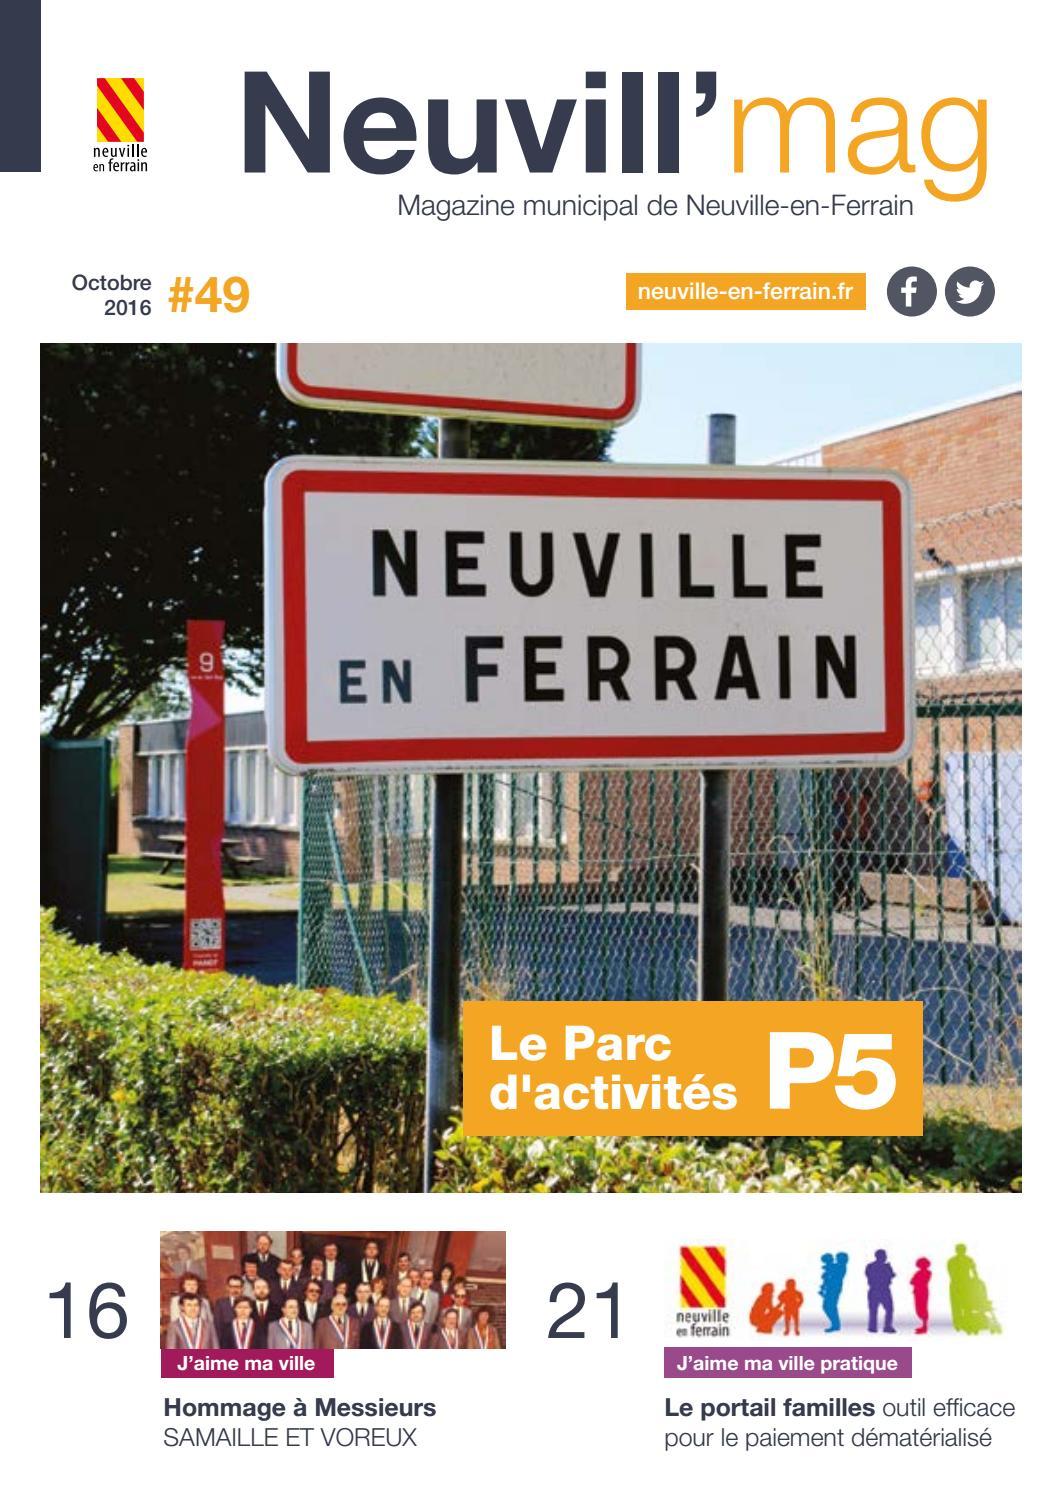 neuvill 39 mag n 49 by mairie de neuville en ferrain issuu. Black Bedroom Furniture Sets. Home Design Ideas